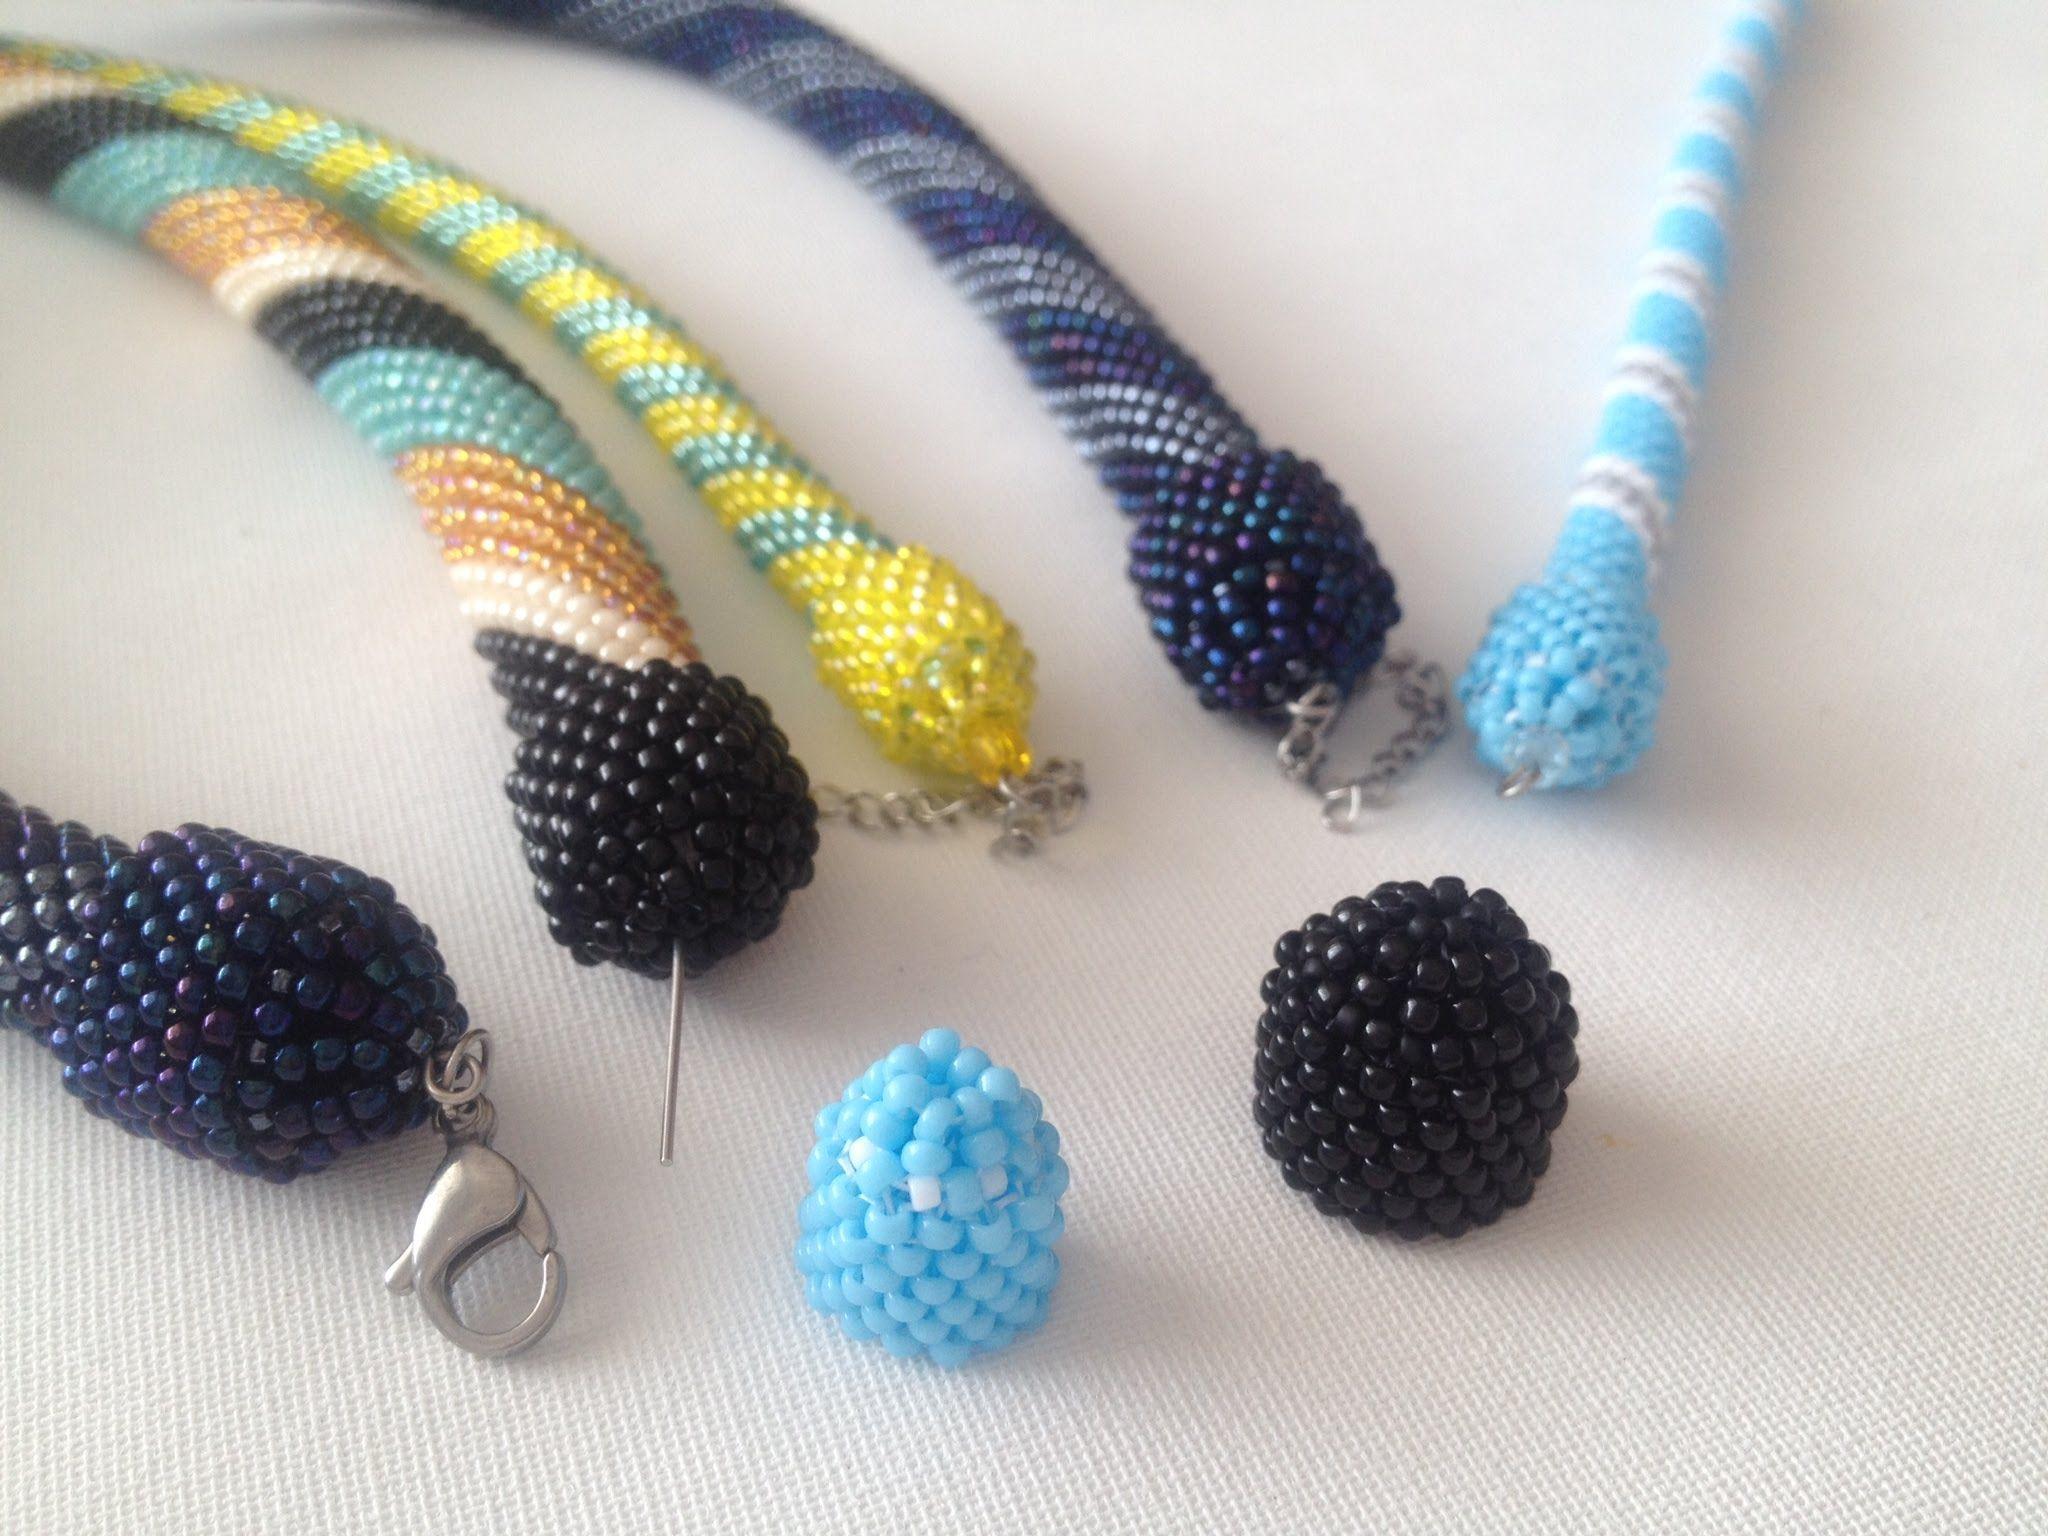 bead crochet tutorial video